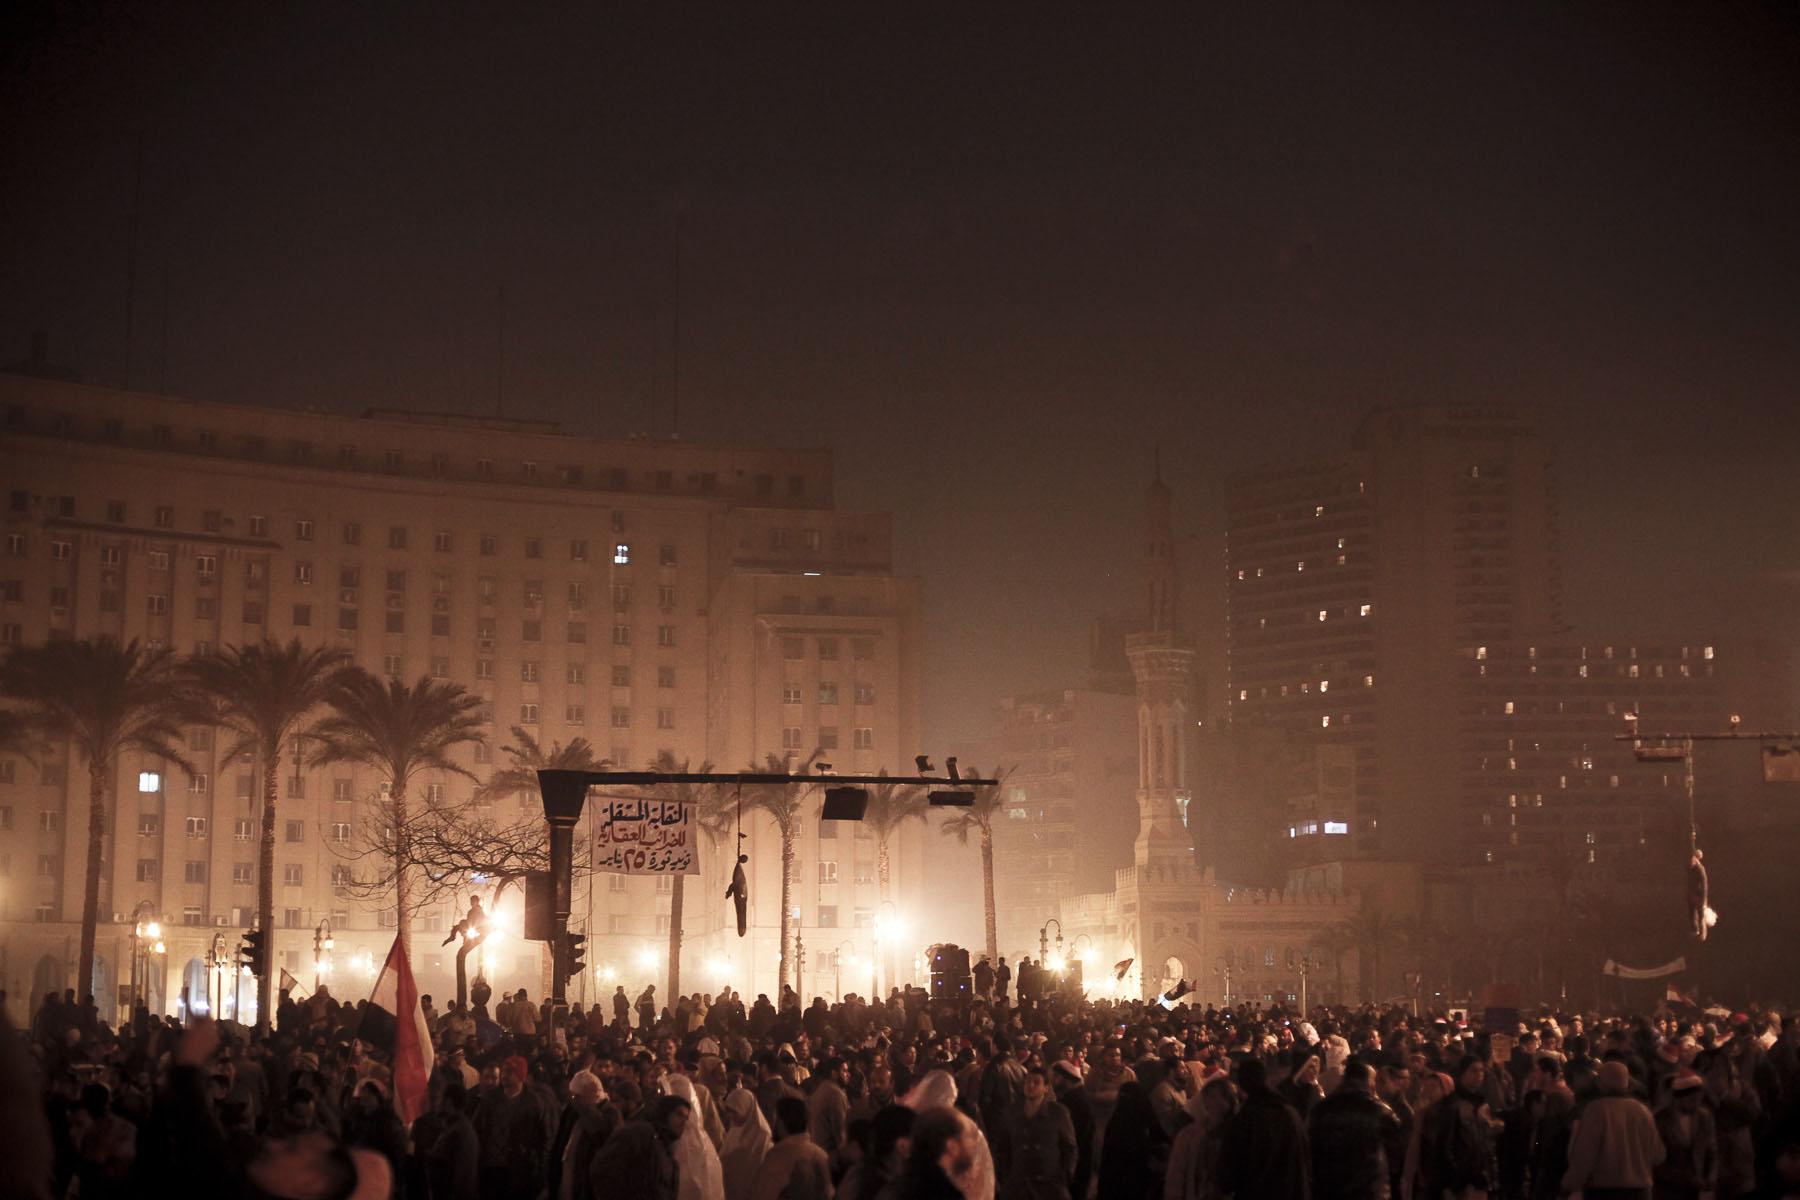 Anti-President Mubarak's demonstrators on Tahrir Square on Saturday February 5 2011